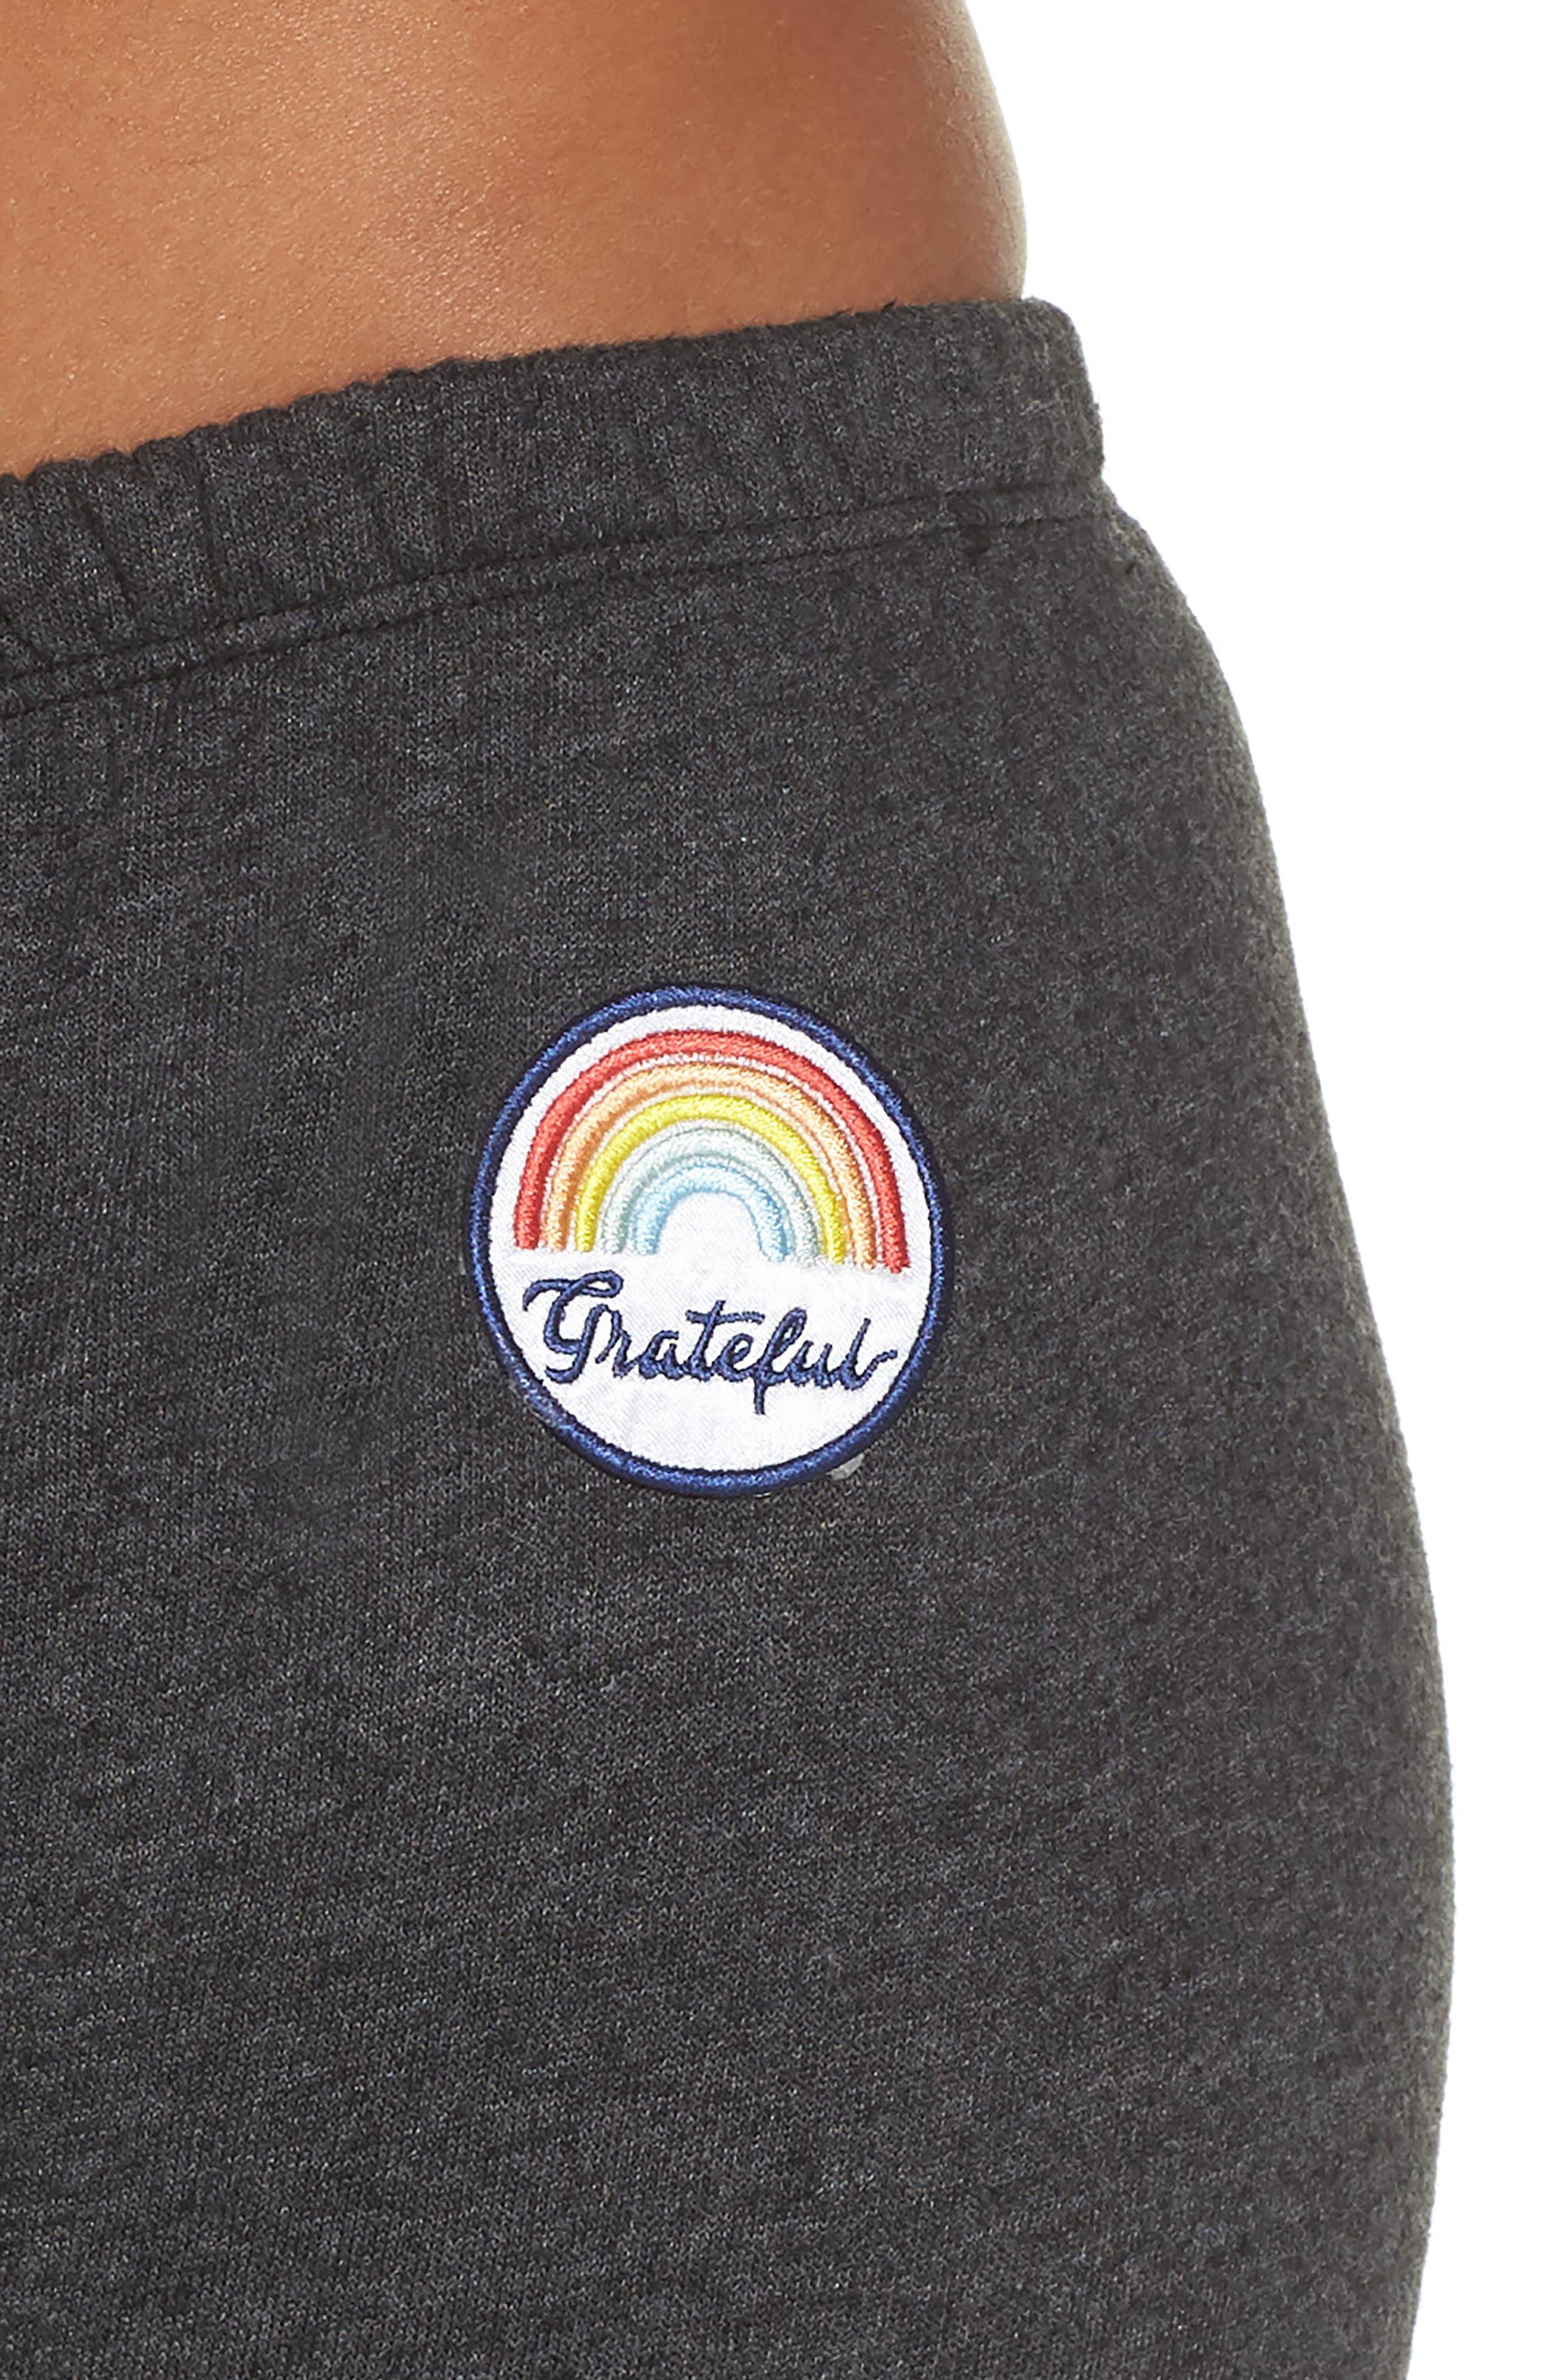 Grateful Perfect Knit Pants,                             Alternate thumbnail 4, color,                             009